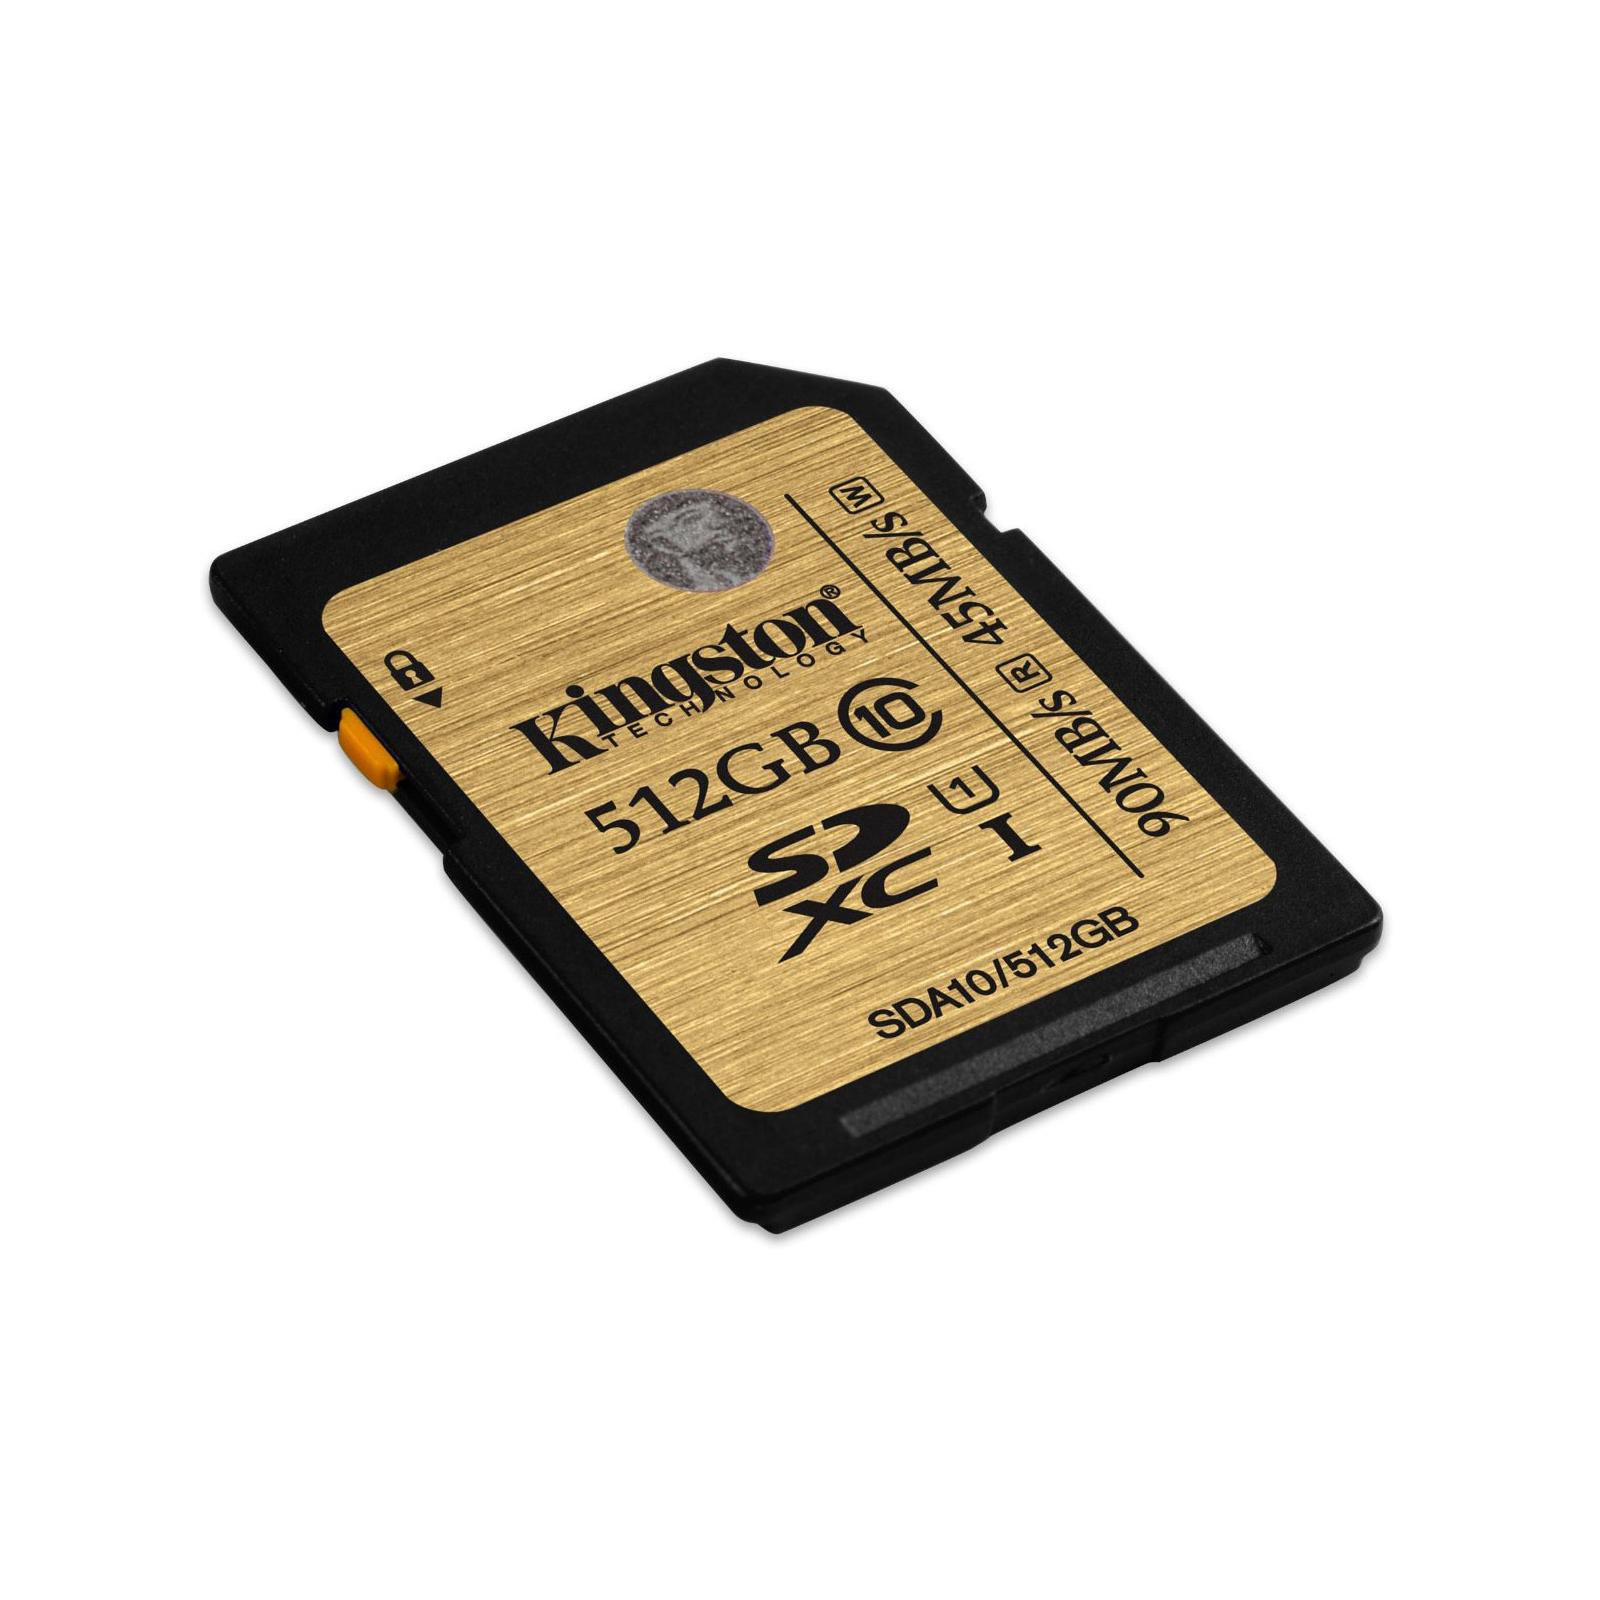 Карта памяти Kingston 512GB SDXC class10 UHS-I (SDA10/512GB) изображение 2